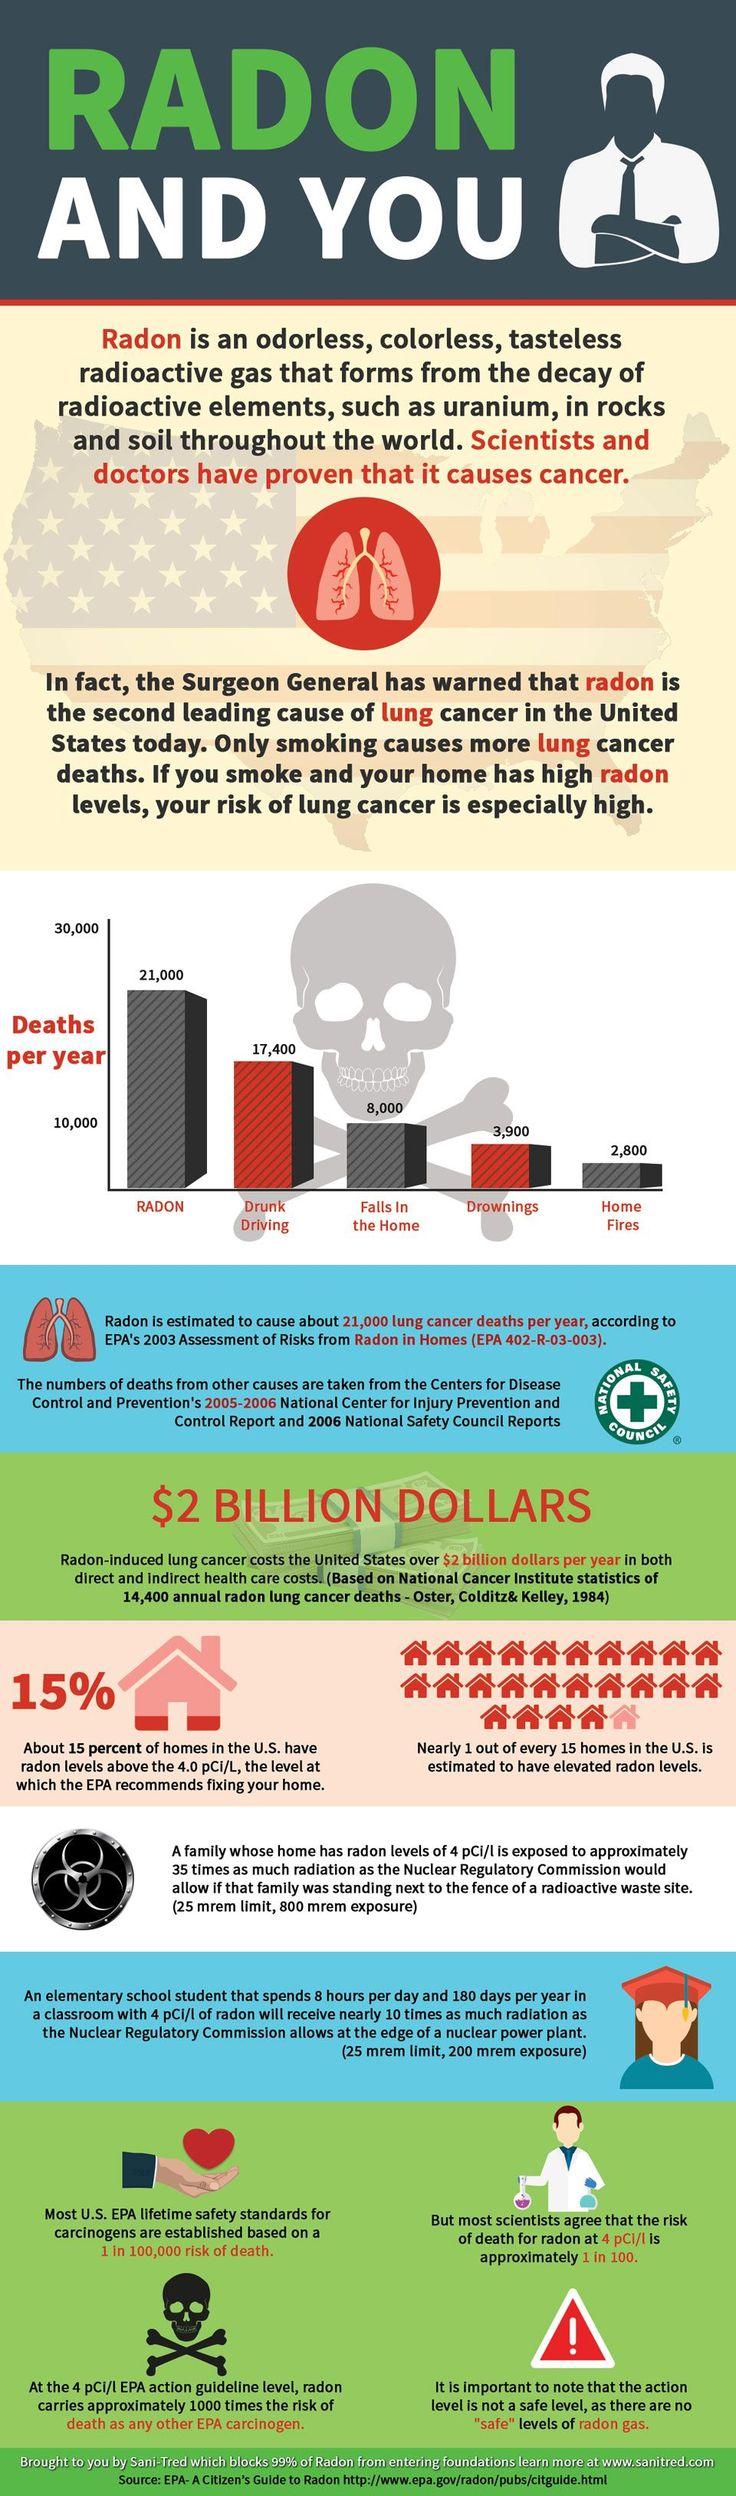 Radon is an odorless, colorless, tasteless radioactive gas